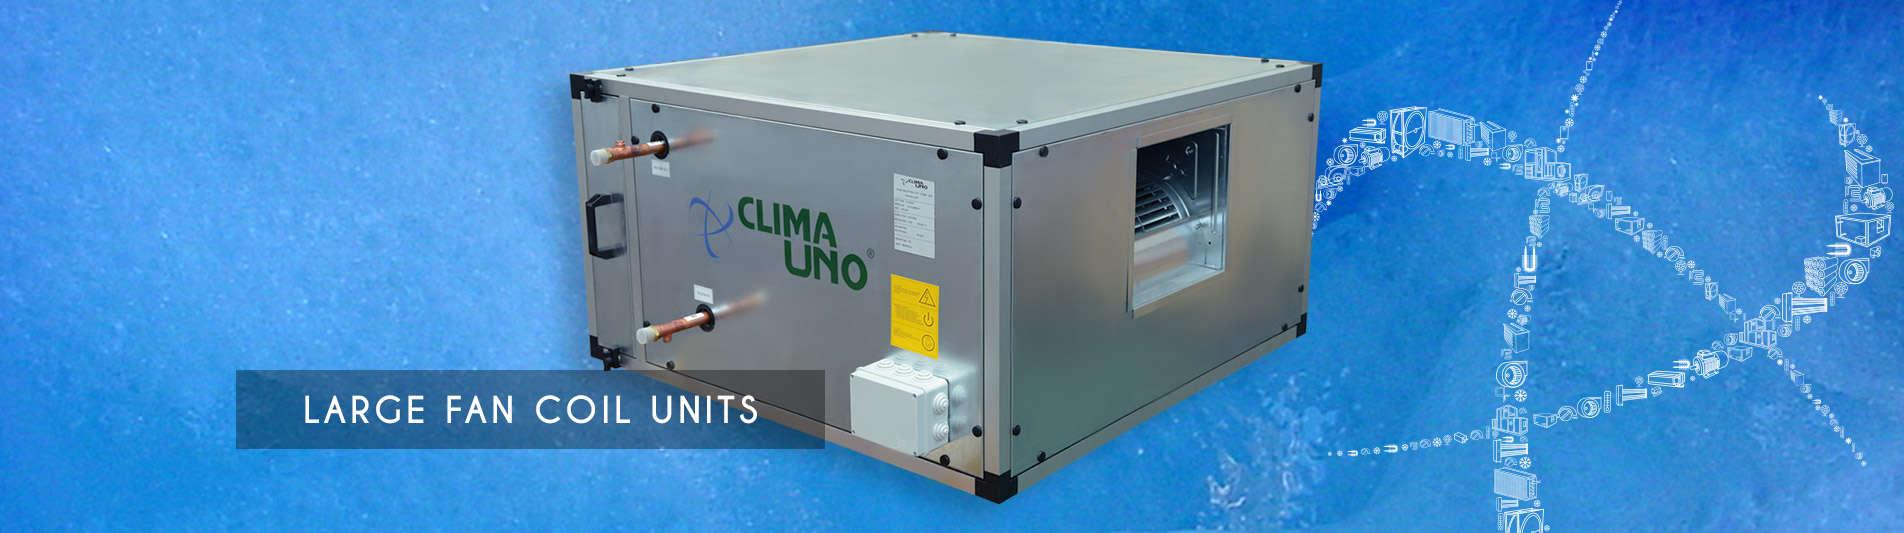 Air Handling Unit   Clima Uno